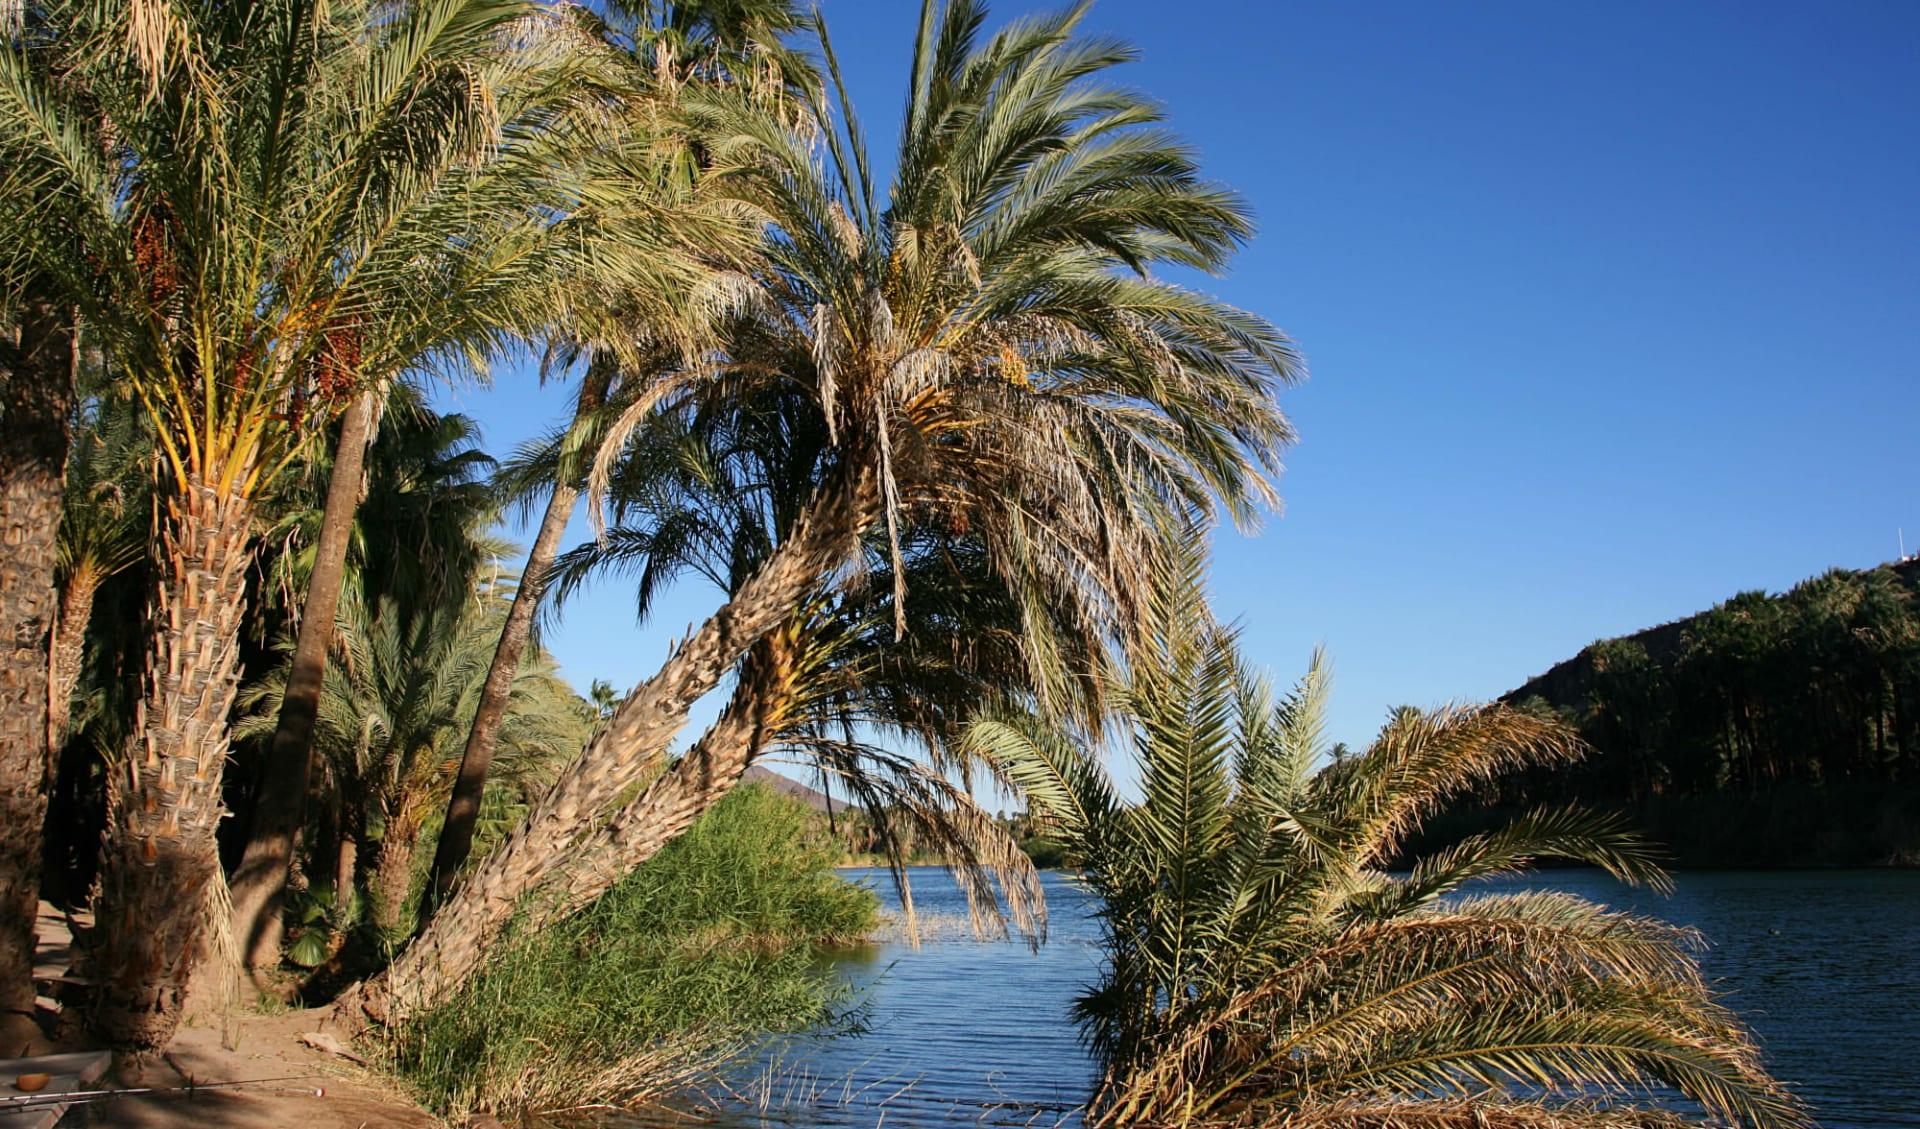 Gruppenreise Baja California ab La Paz: